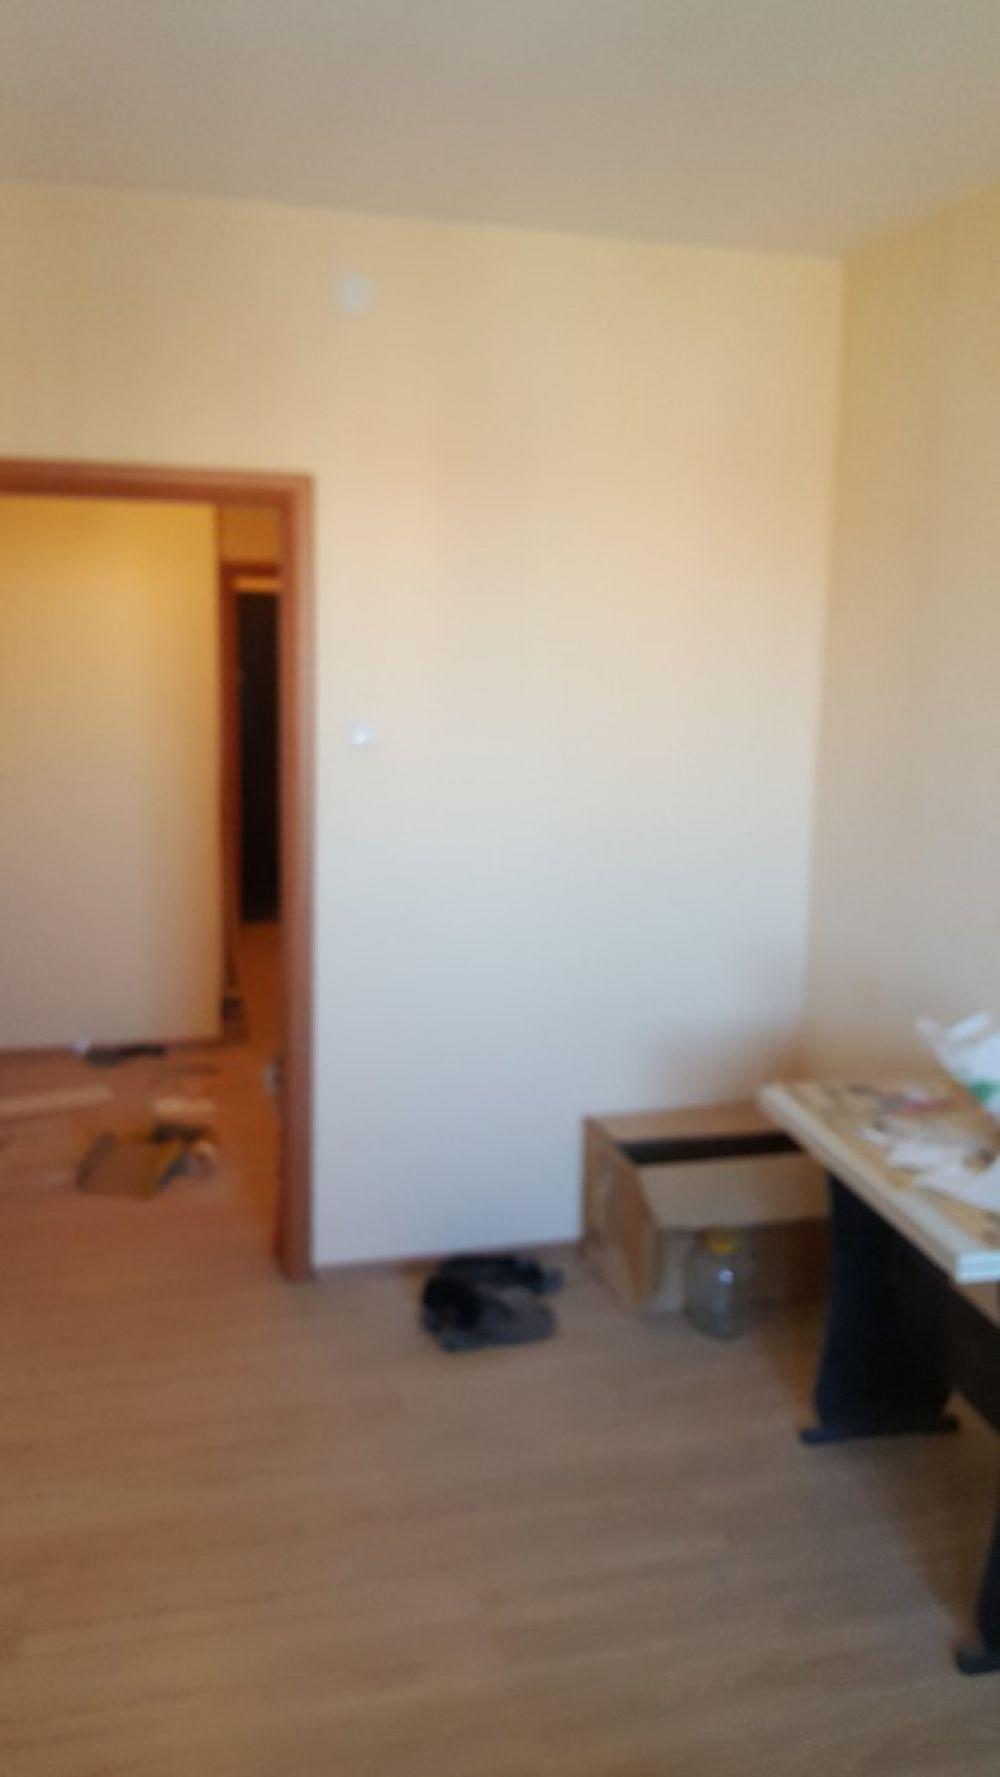 1-к квартира 30 м2, Щёлково, микрорайон Богородский, 16, фото 8